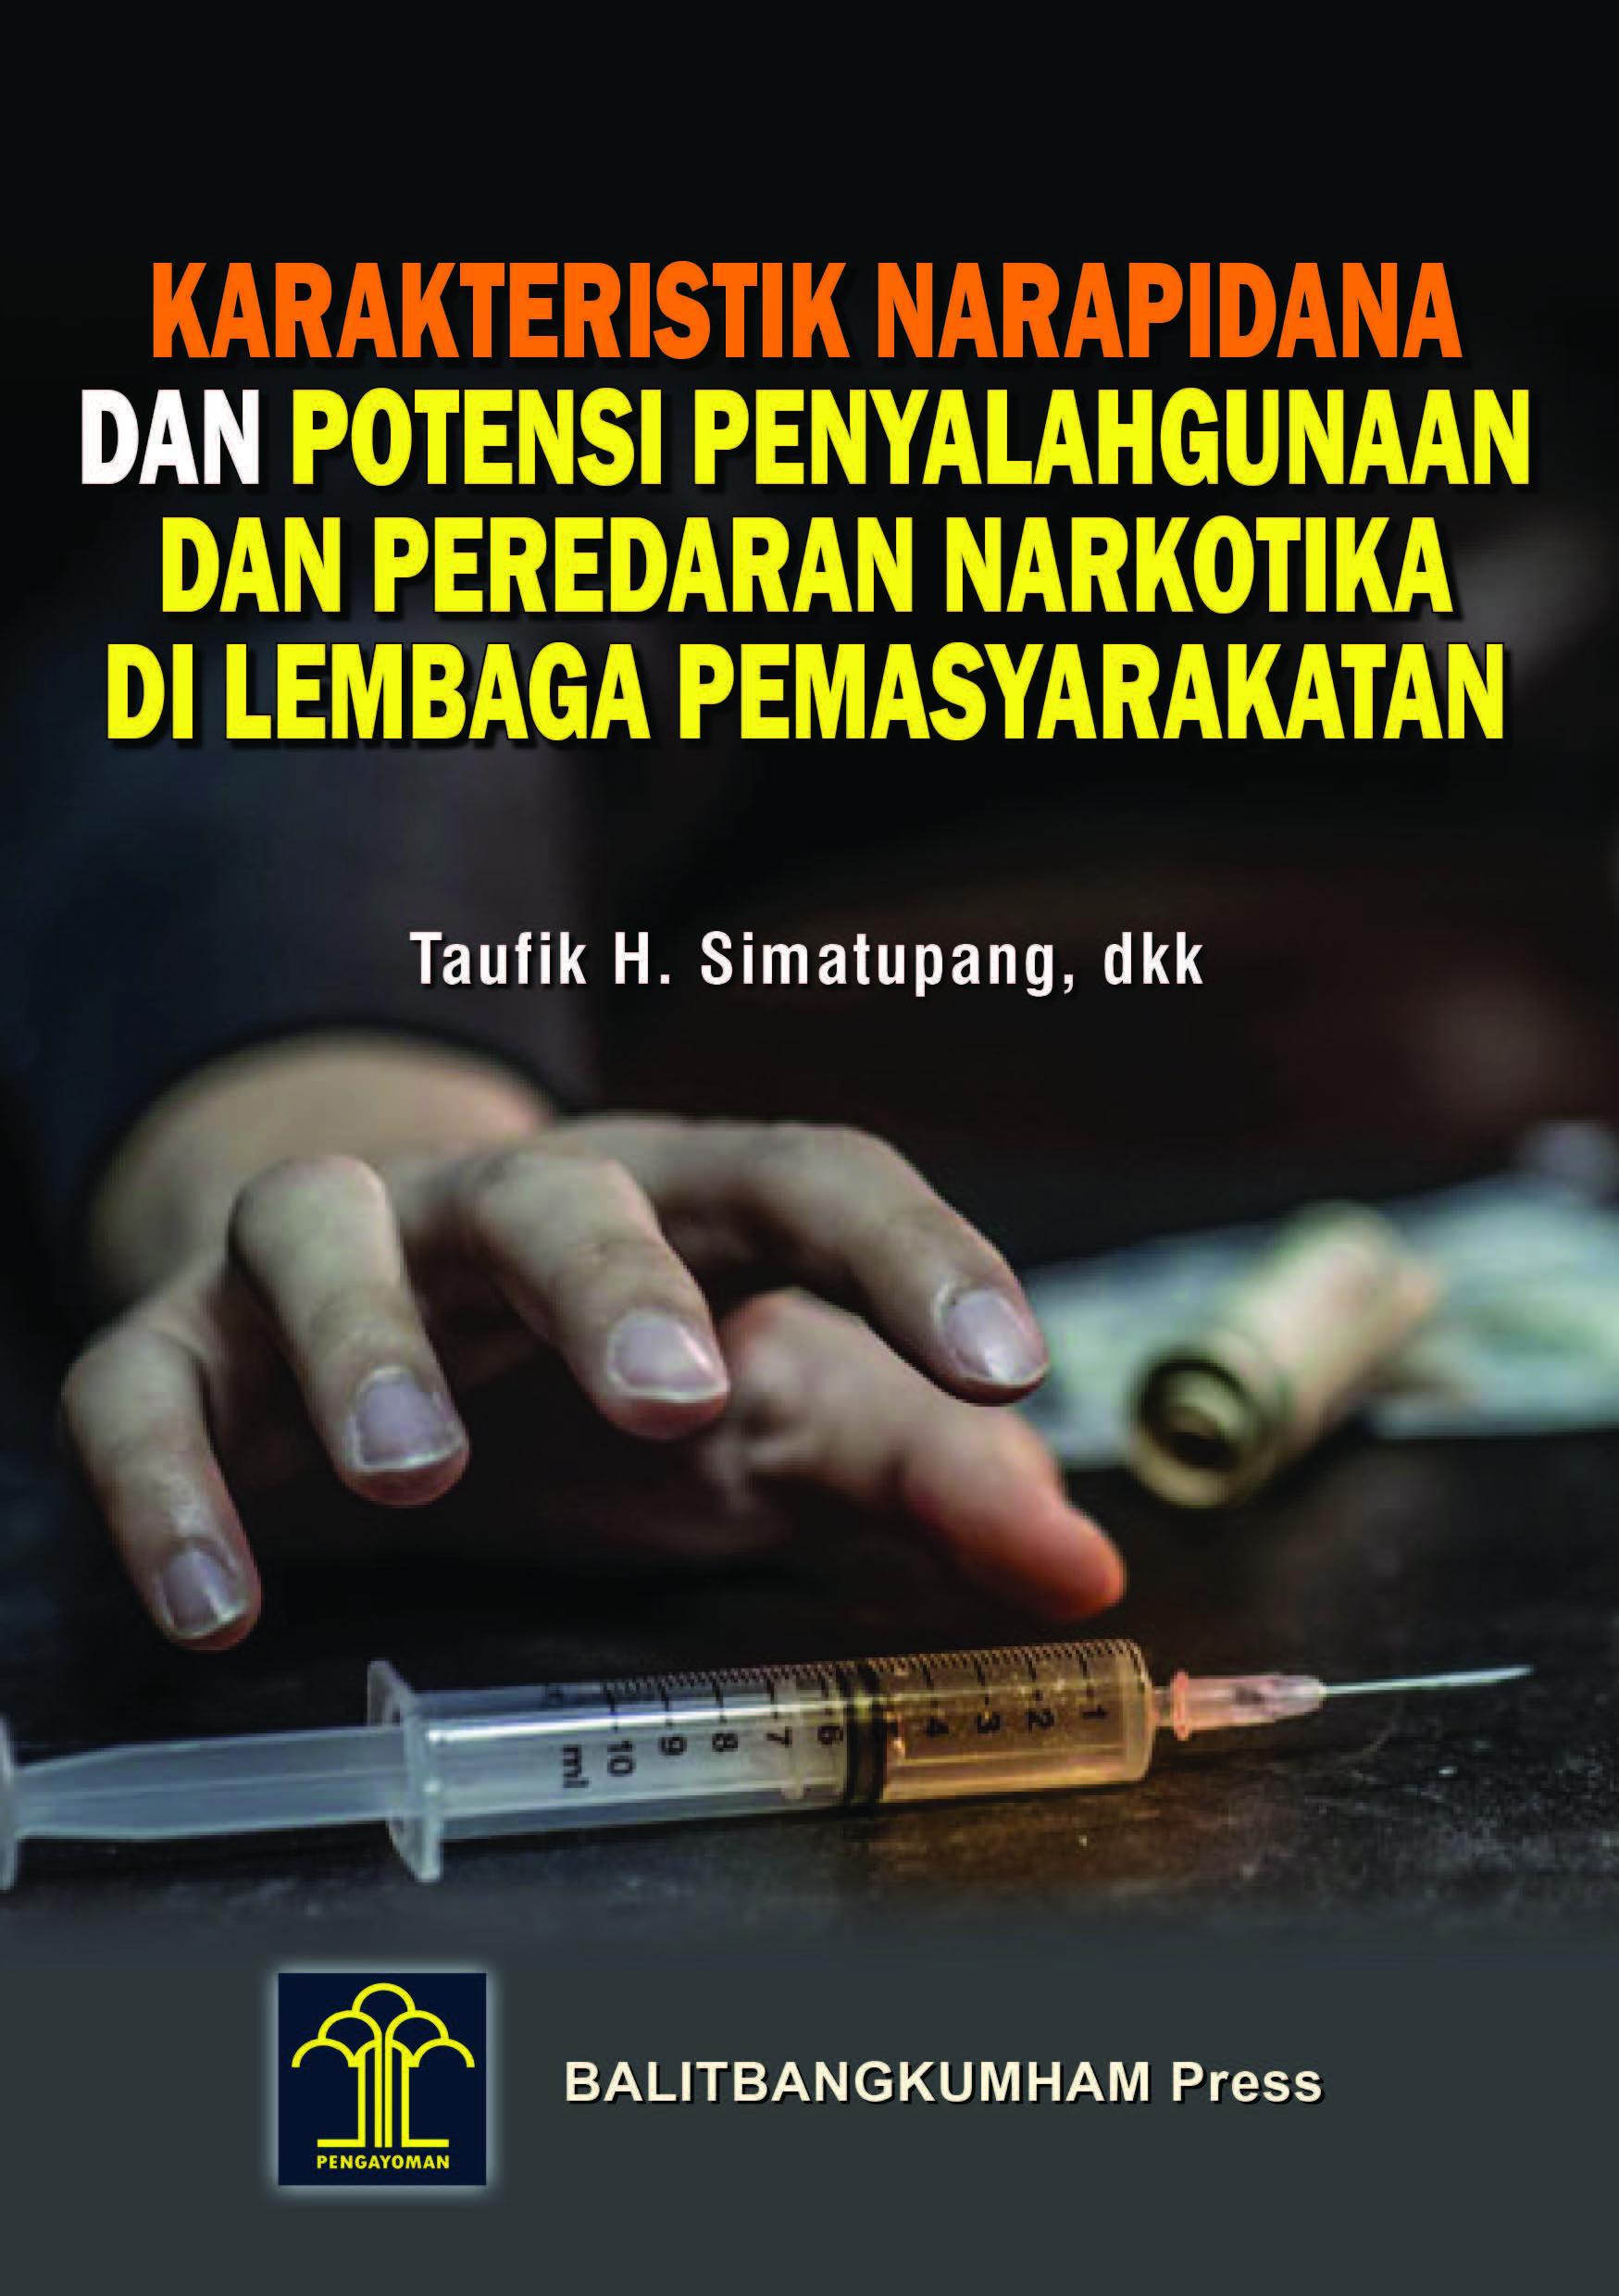 Karakteristik Narapidana dan Potensi Penyalahgunaan dan Peredaran Narkotika di Lembaga Pemasyarakatan Kasus Narkotika